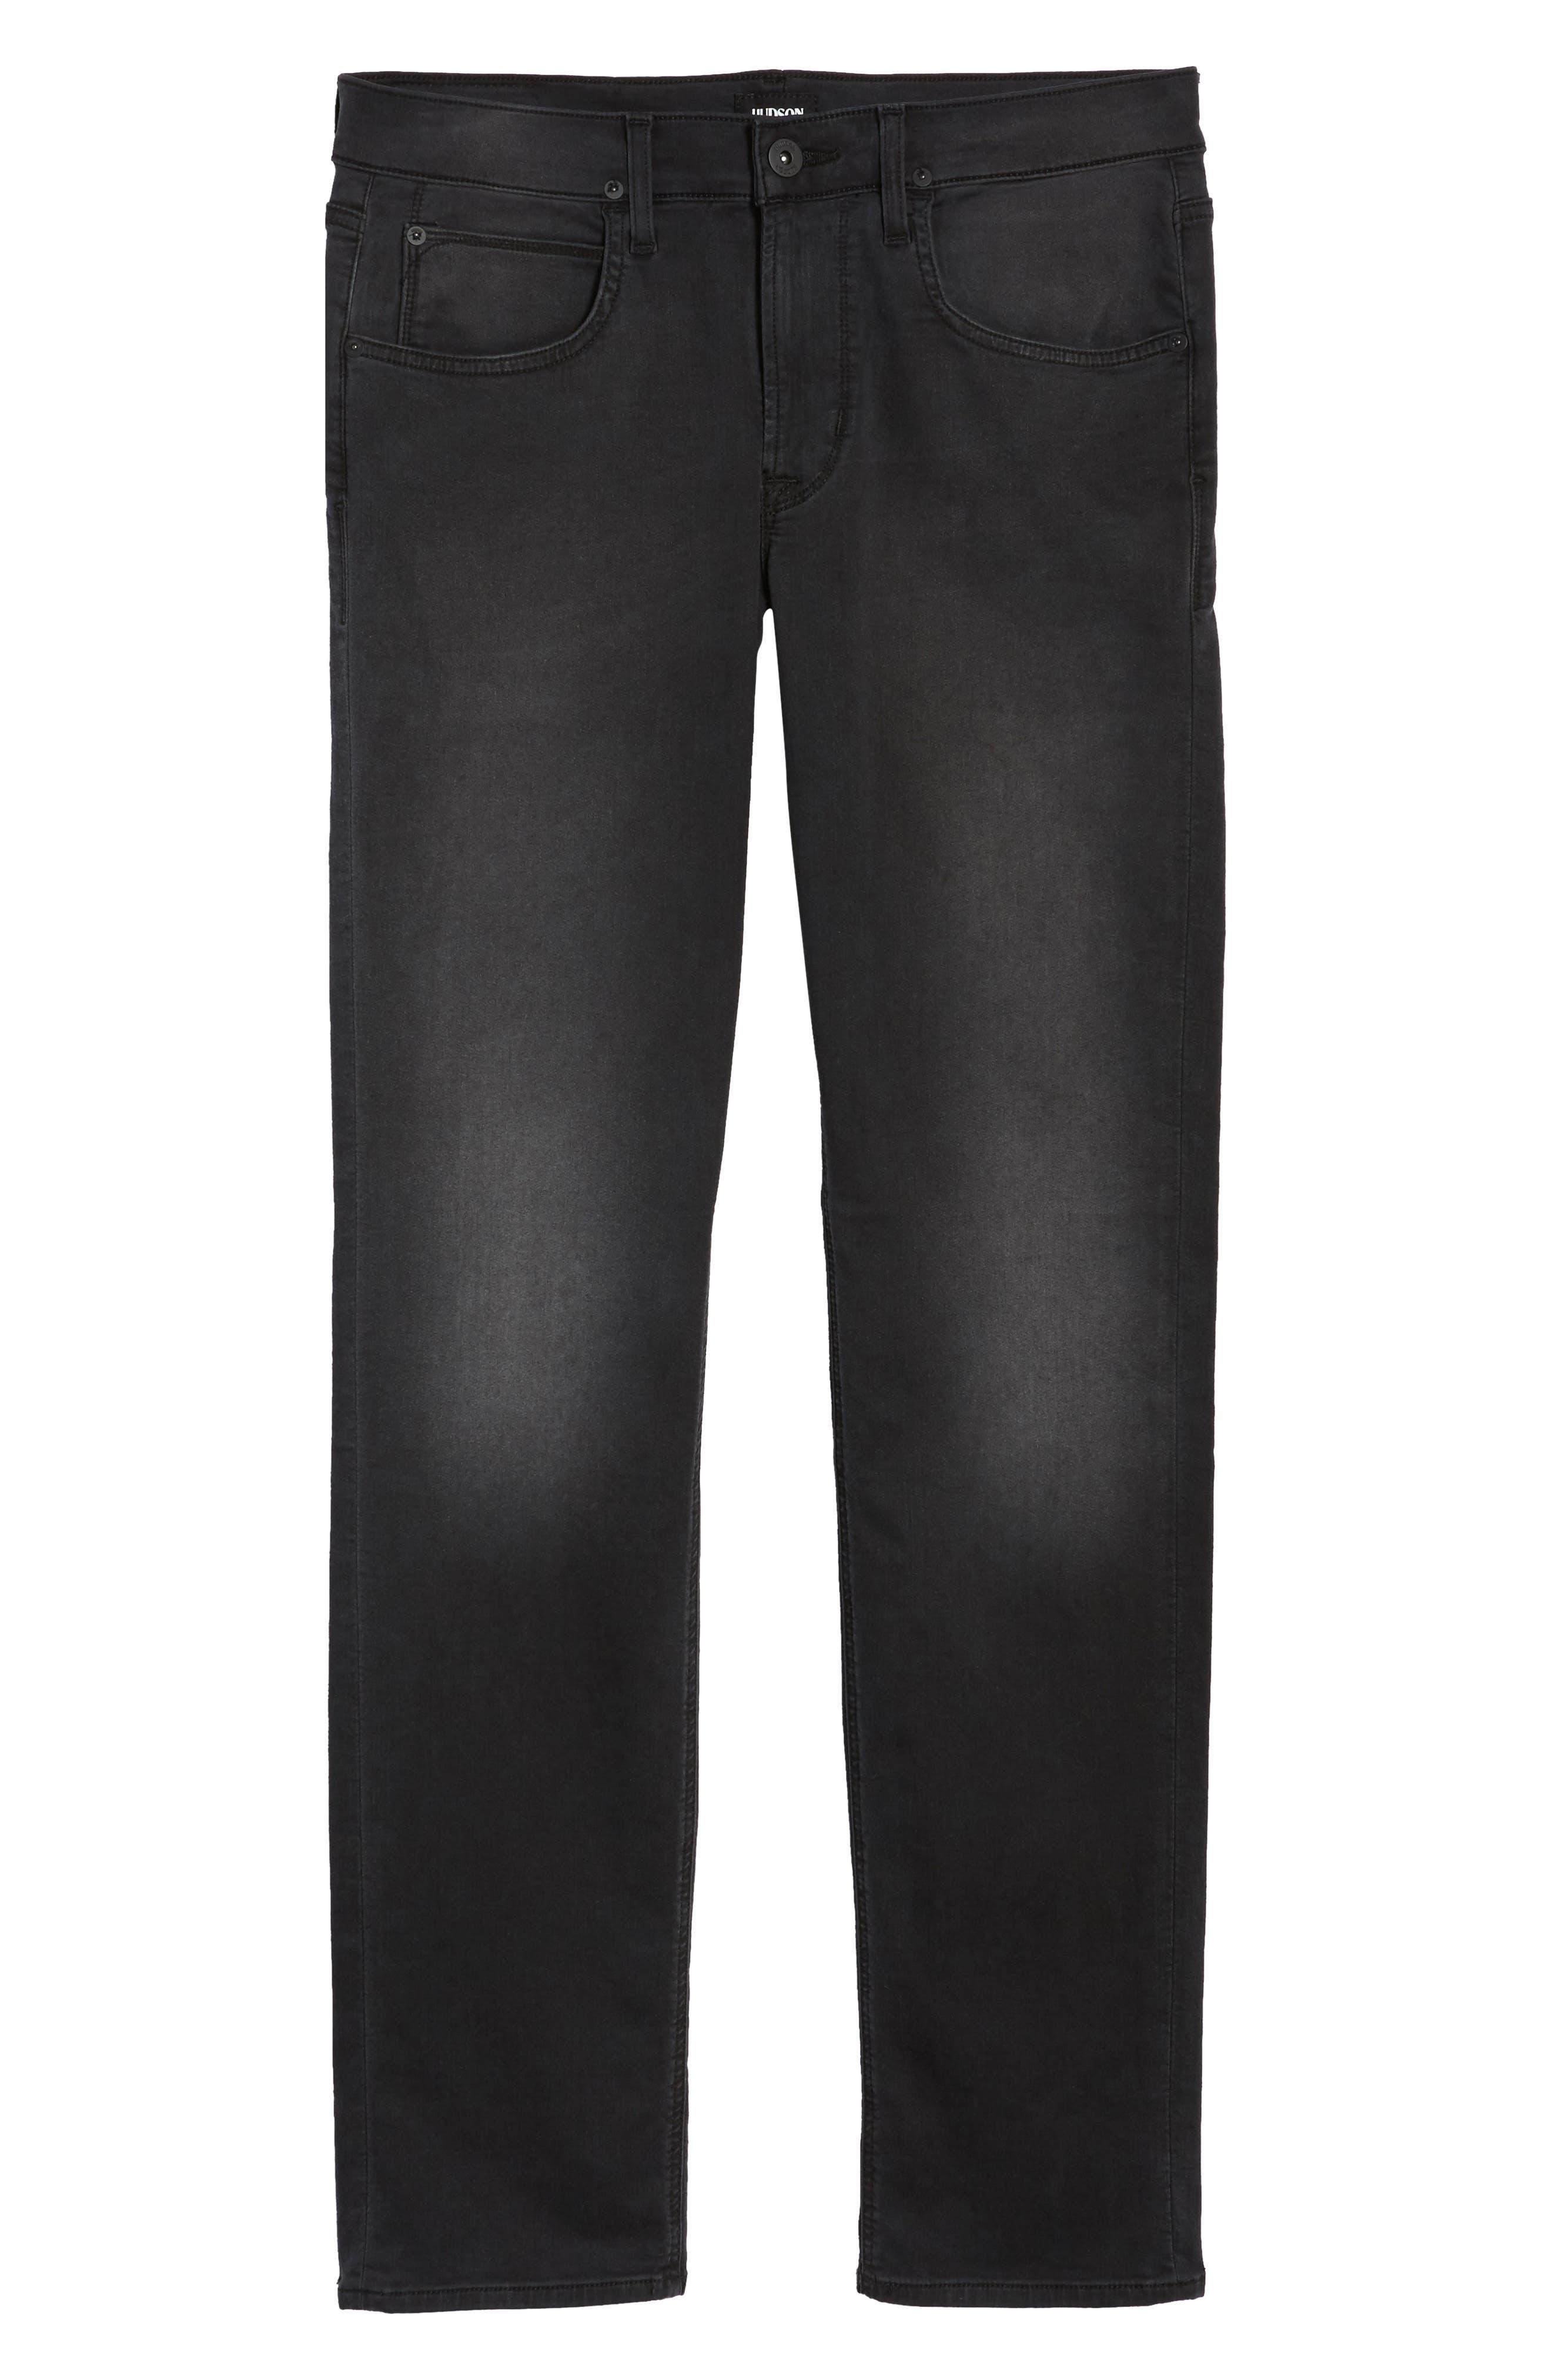 Blake Slim Fit Jeans,                             Alternate thumbnail 6, color,                             001